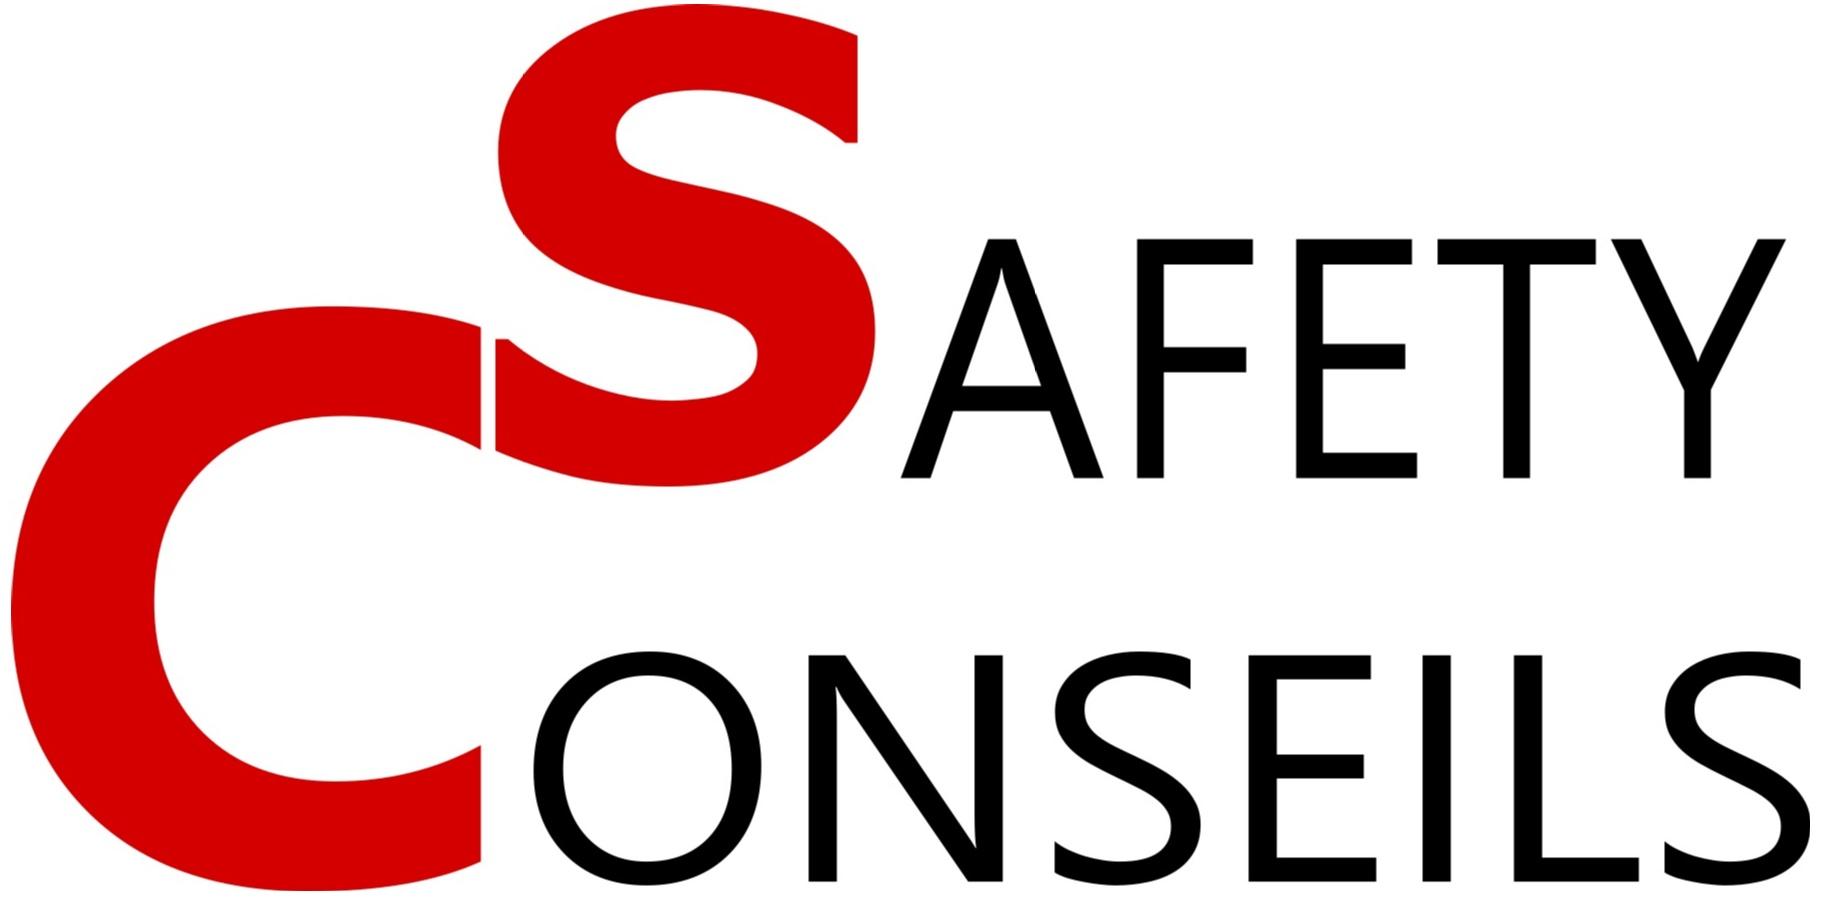 1575456966-safety-conseils-akeoplus-.jpg